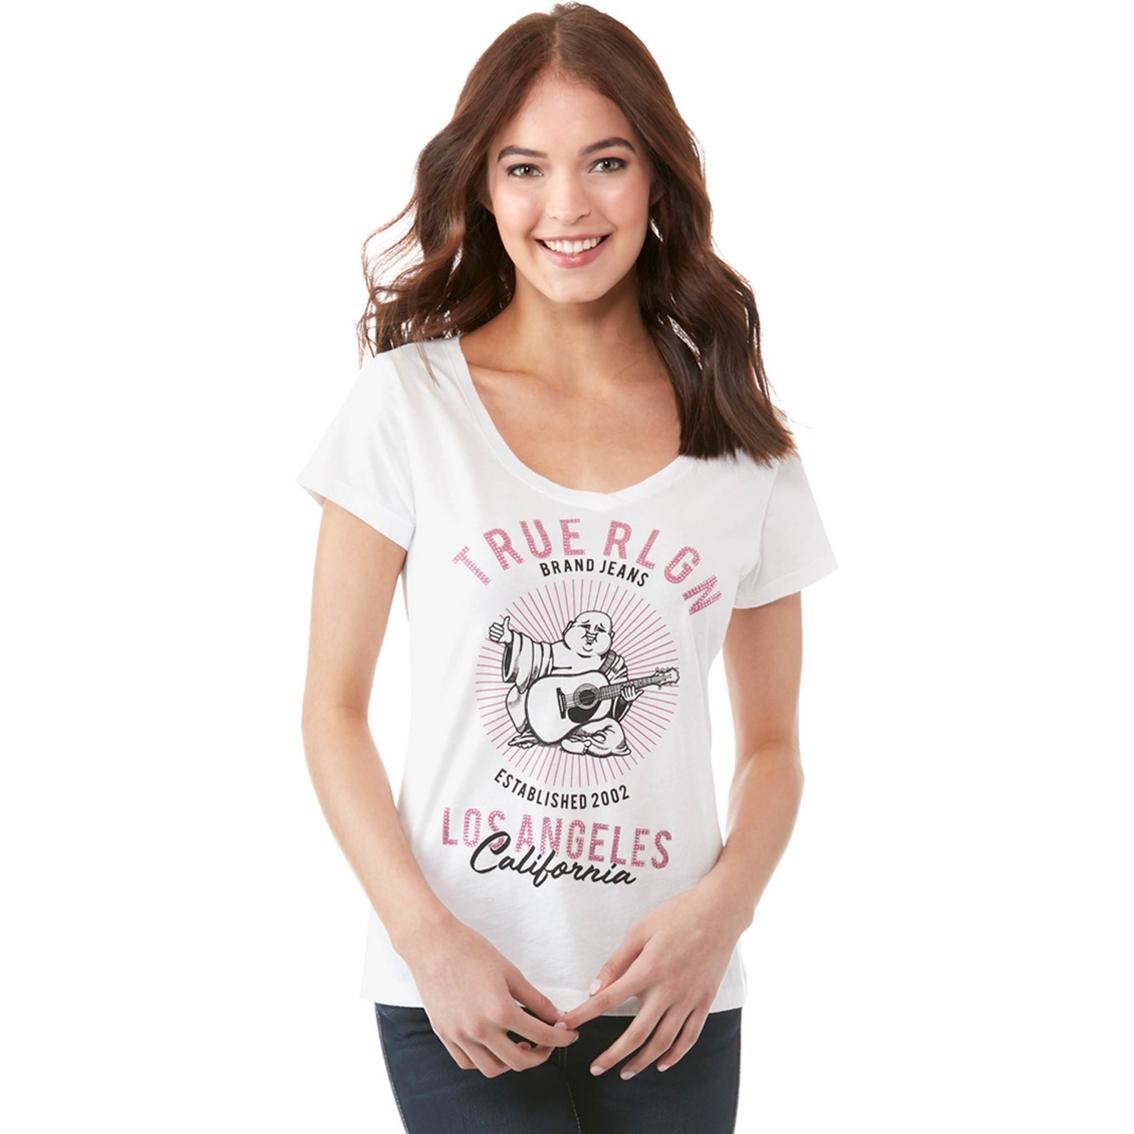 afaf5c70 True Religion Crystal La Buddha Round V Neck Tee   T-shirts ...